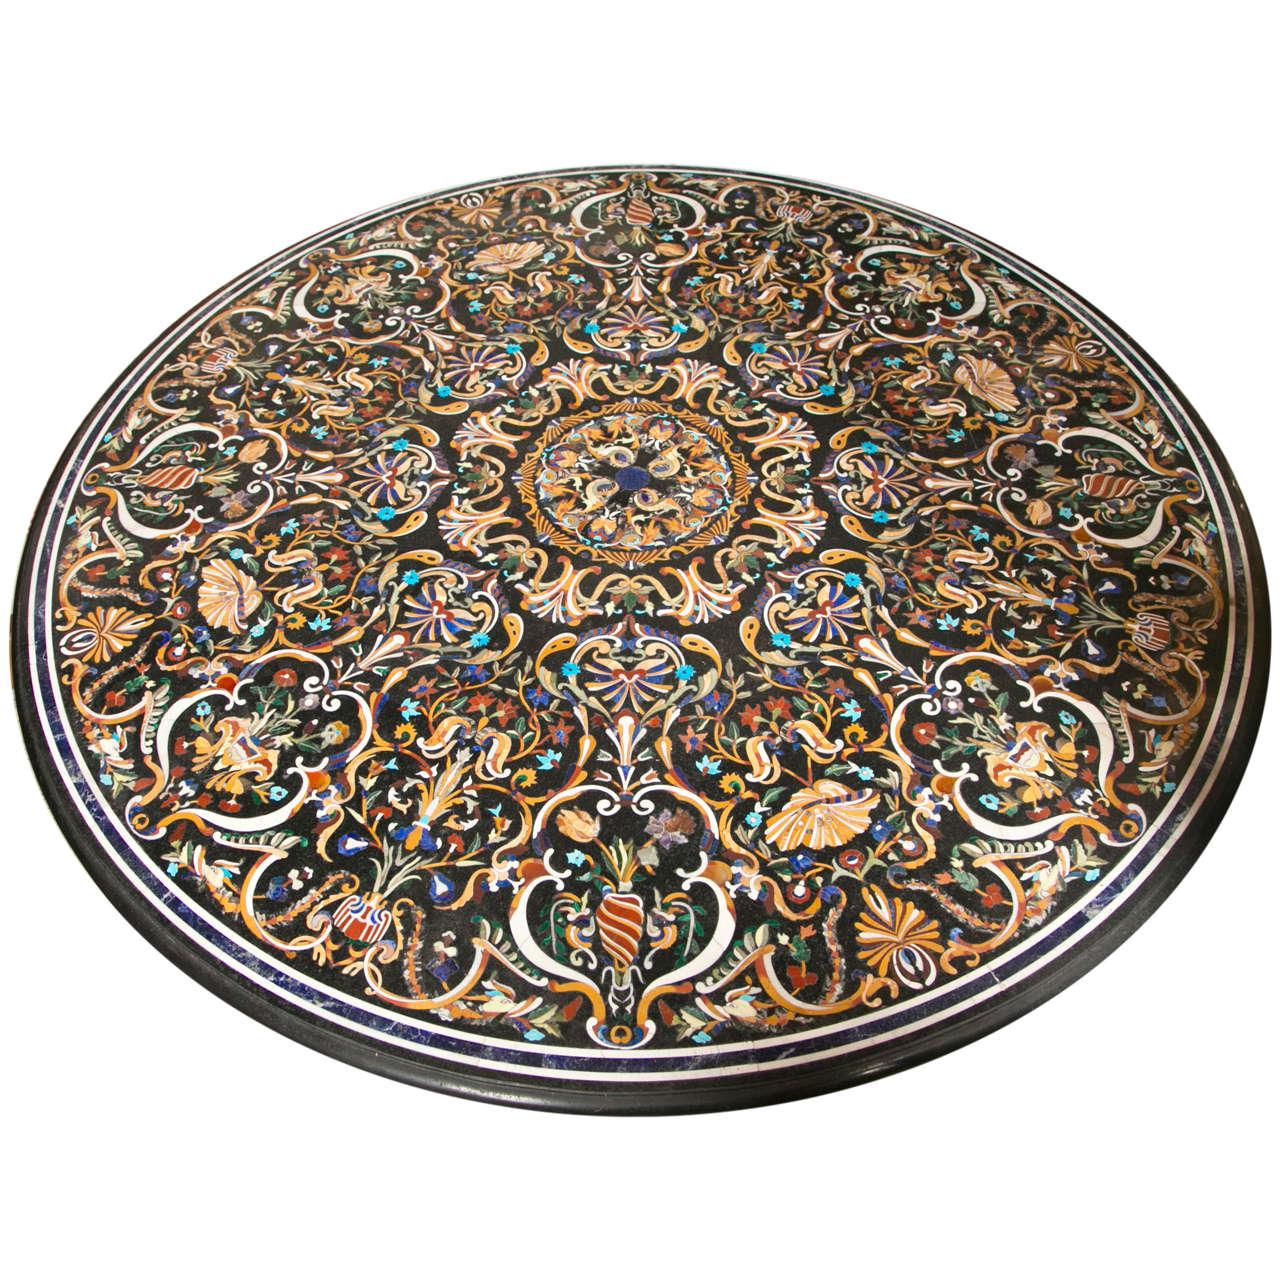 Incredible Pietra Dura Table Top At 1stdibs